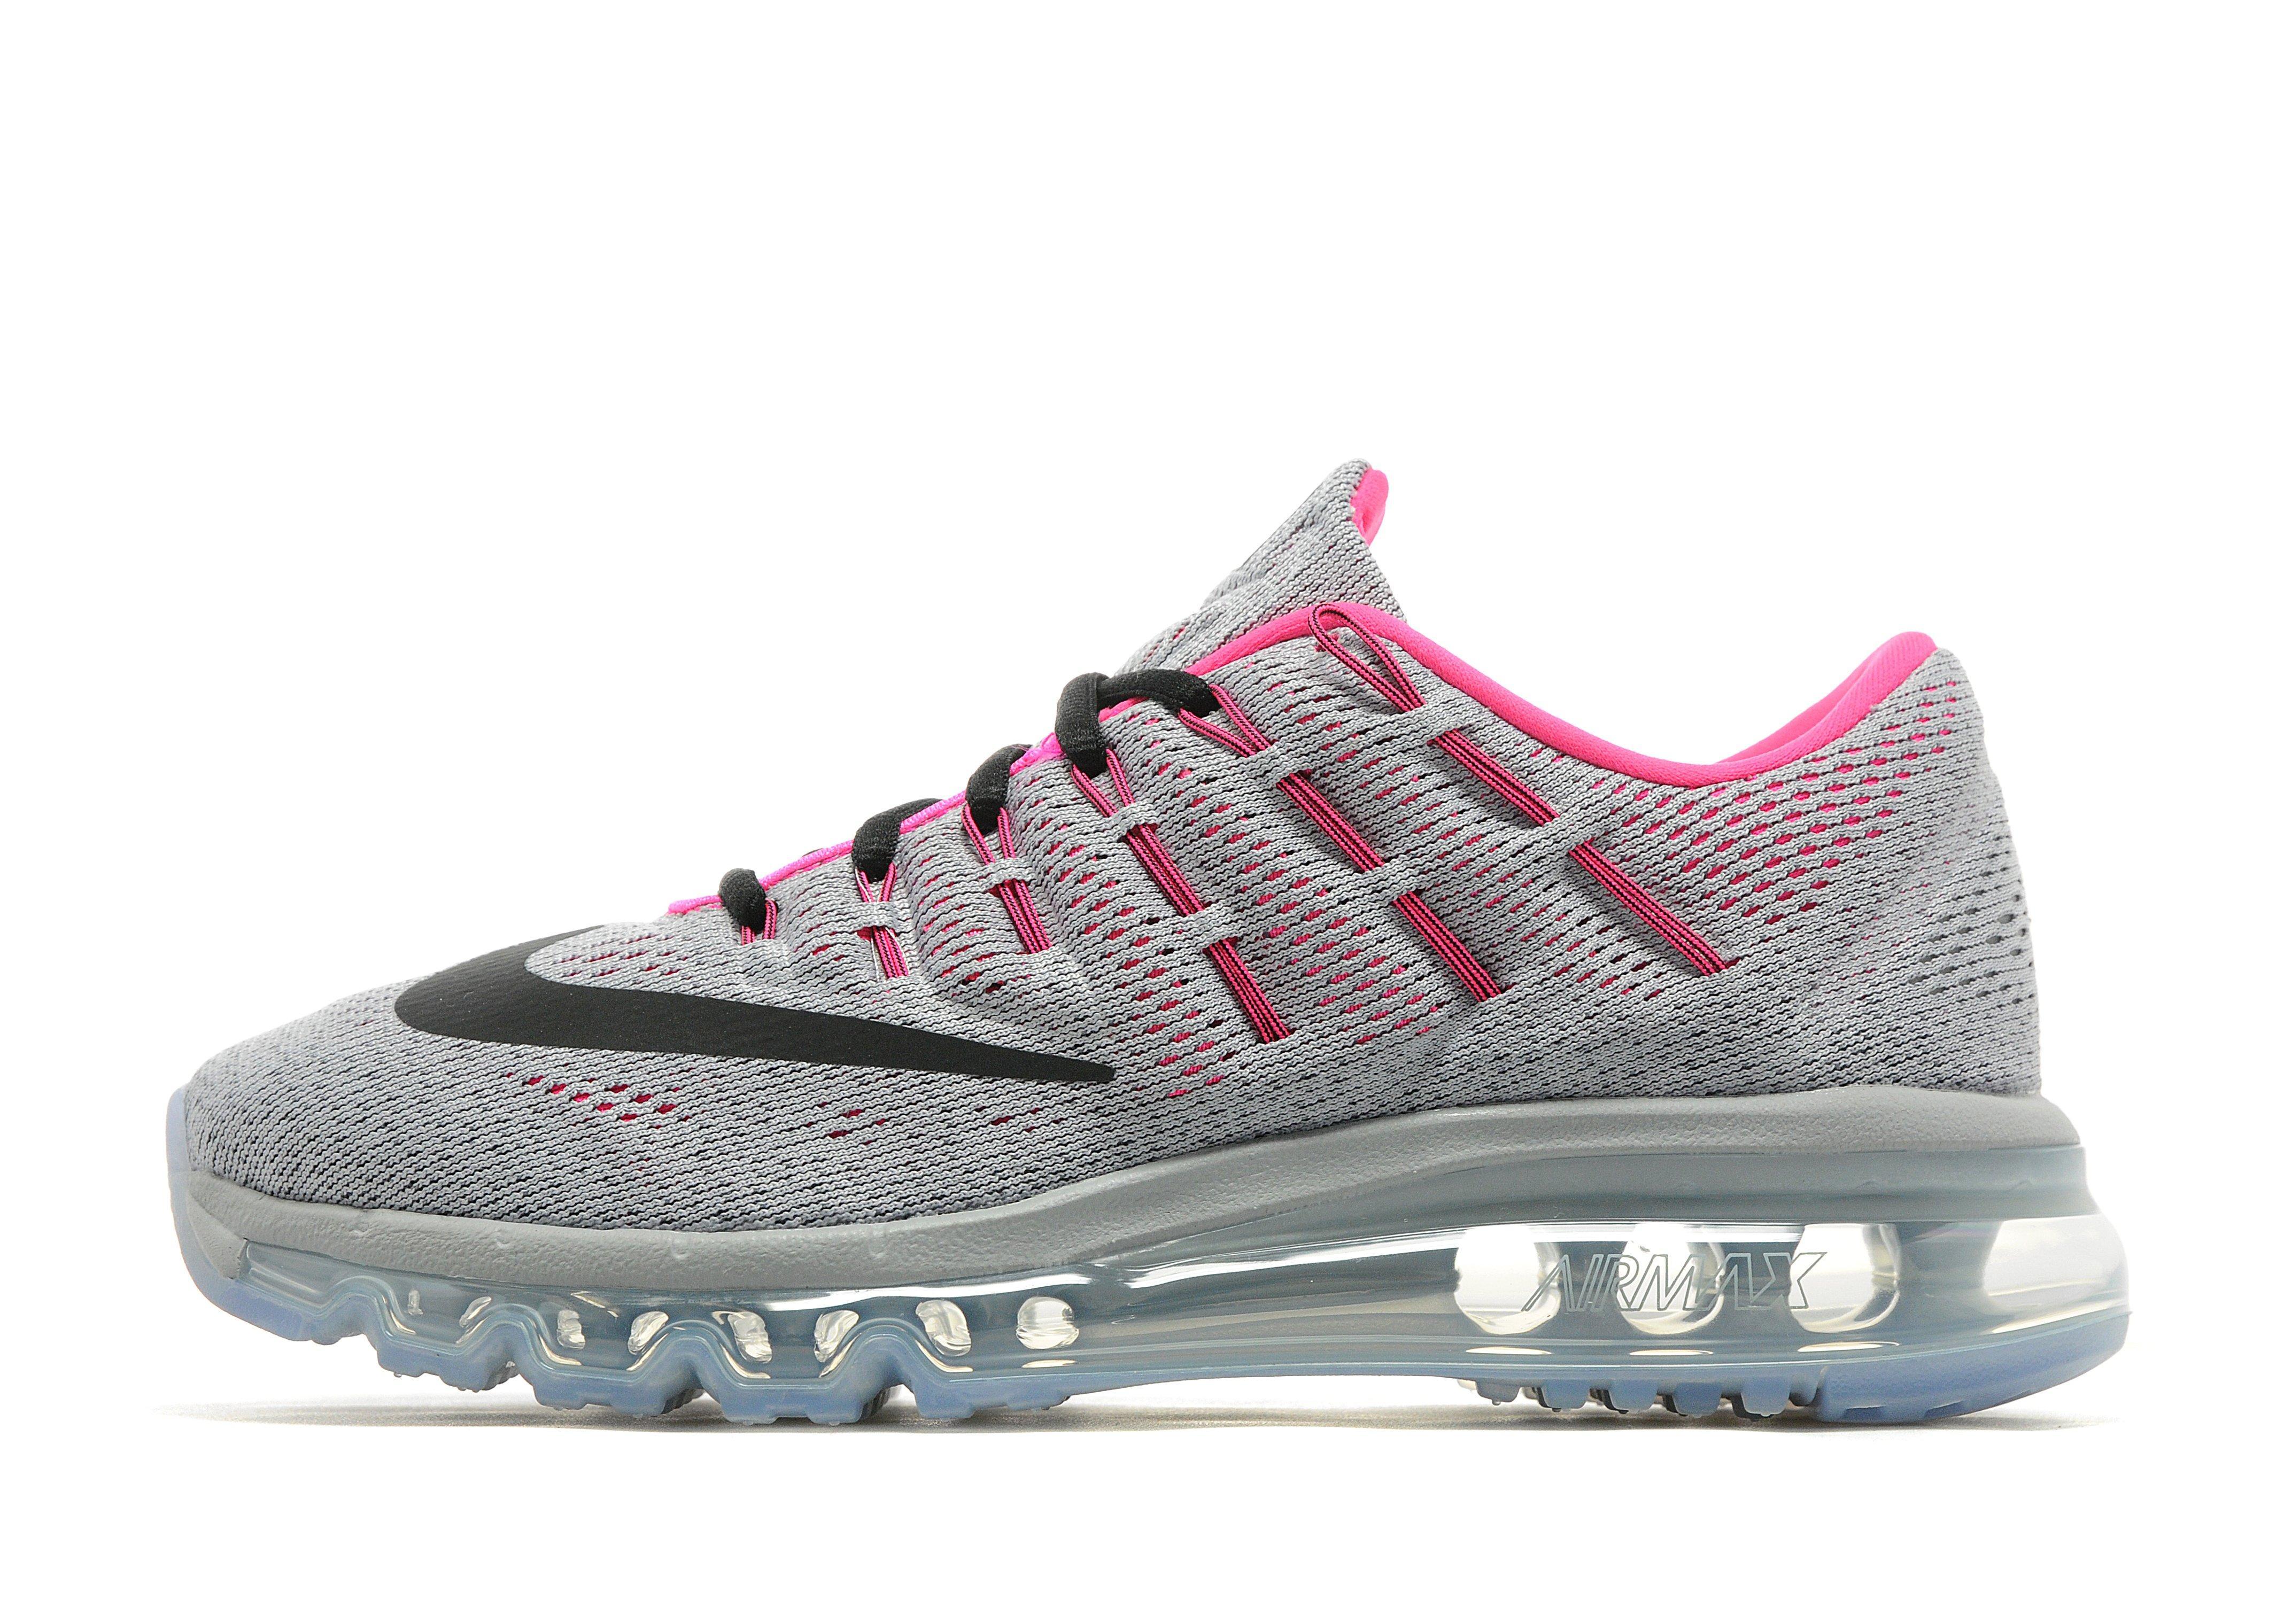 nike air max 2016 dames roze grijs